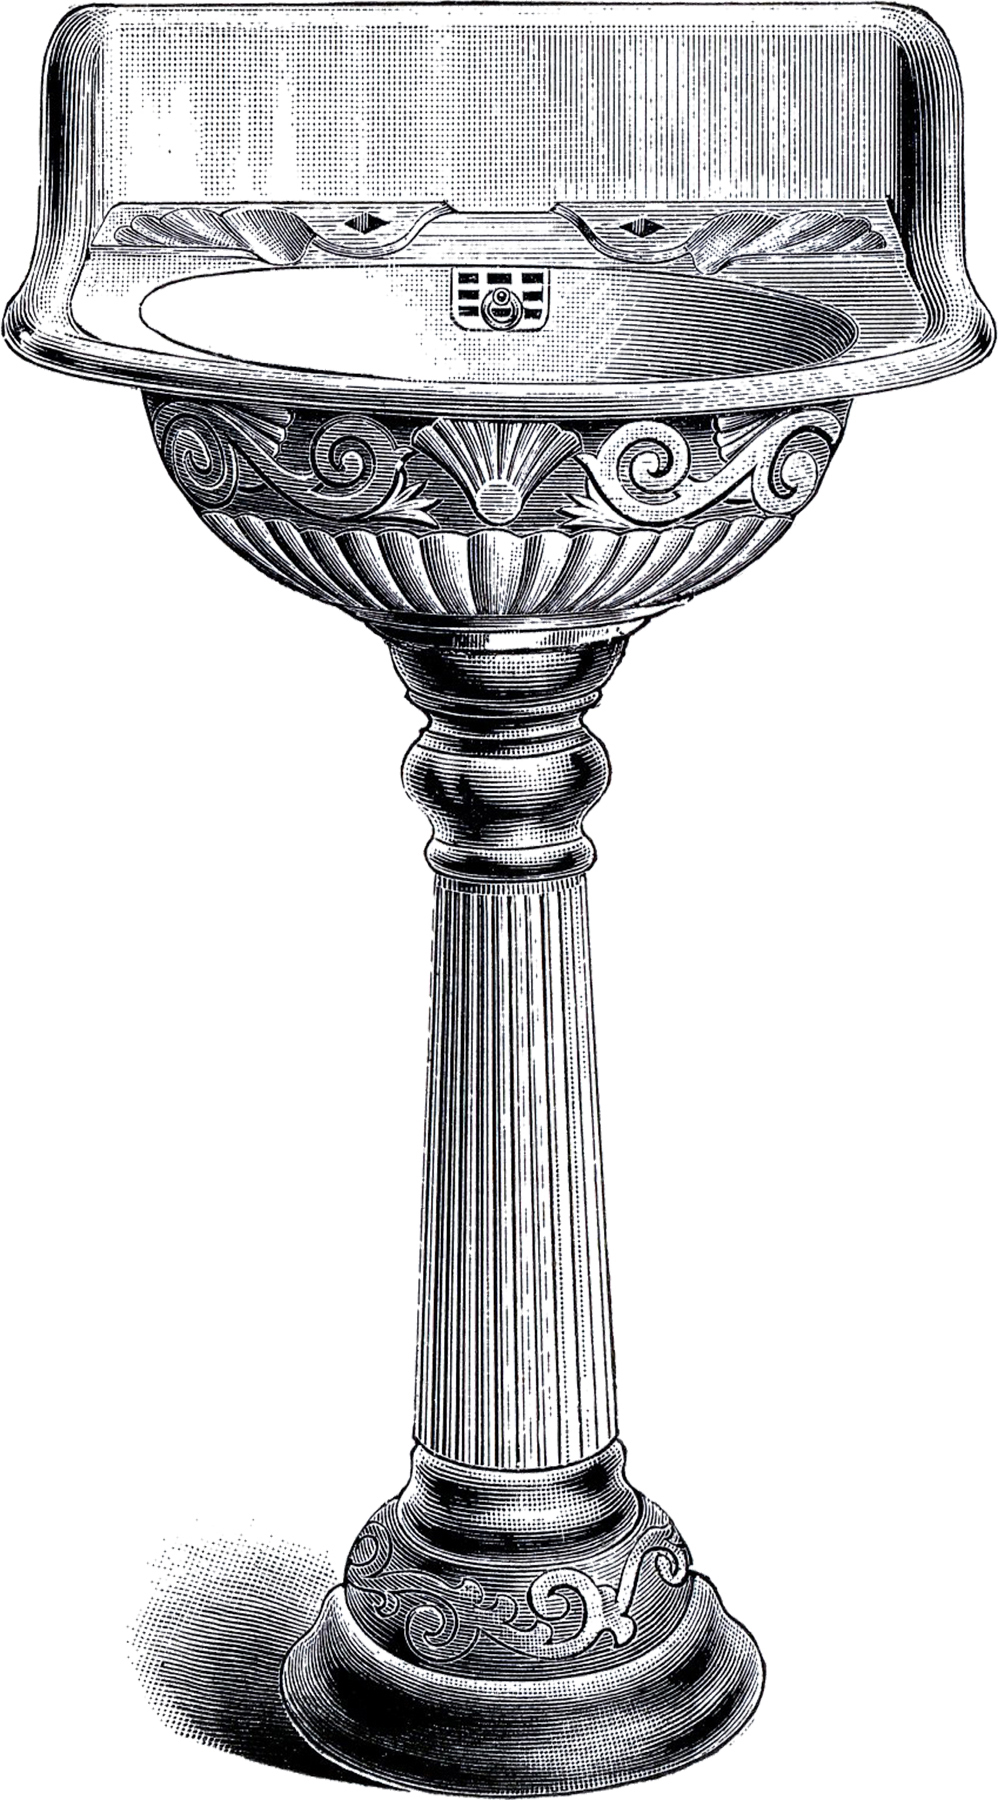 Vintage Pedestal Sink Clip Art The Graphics Fairy